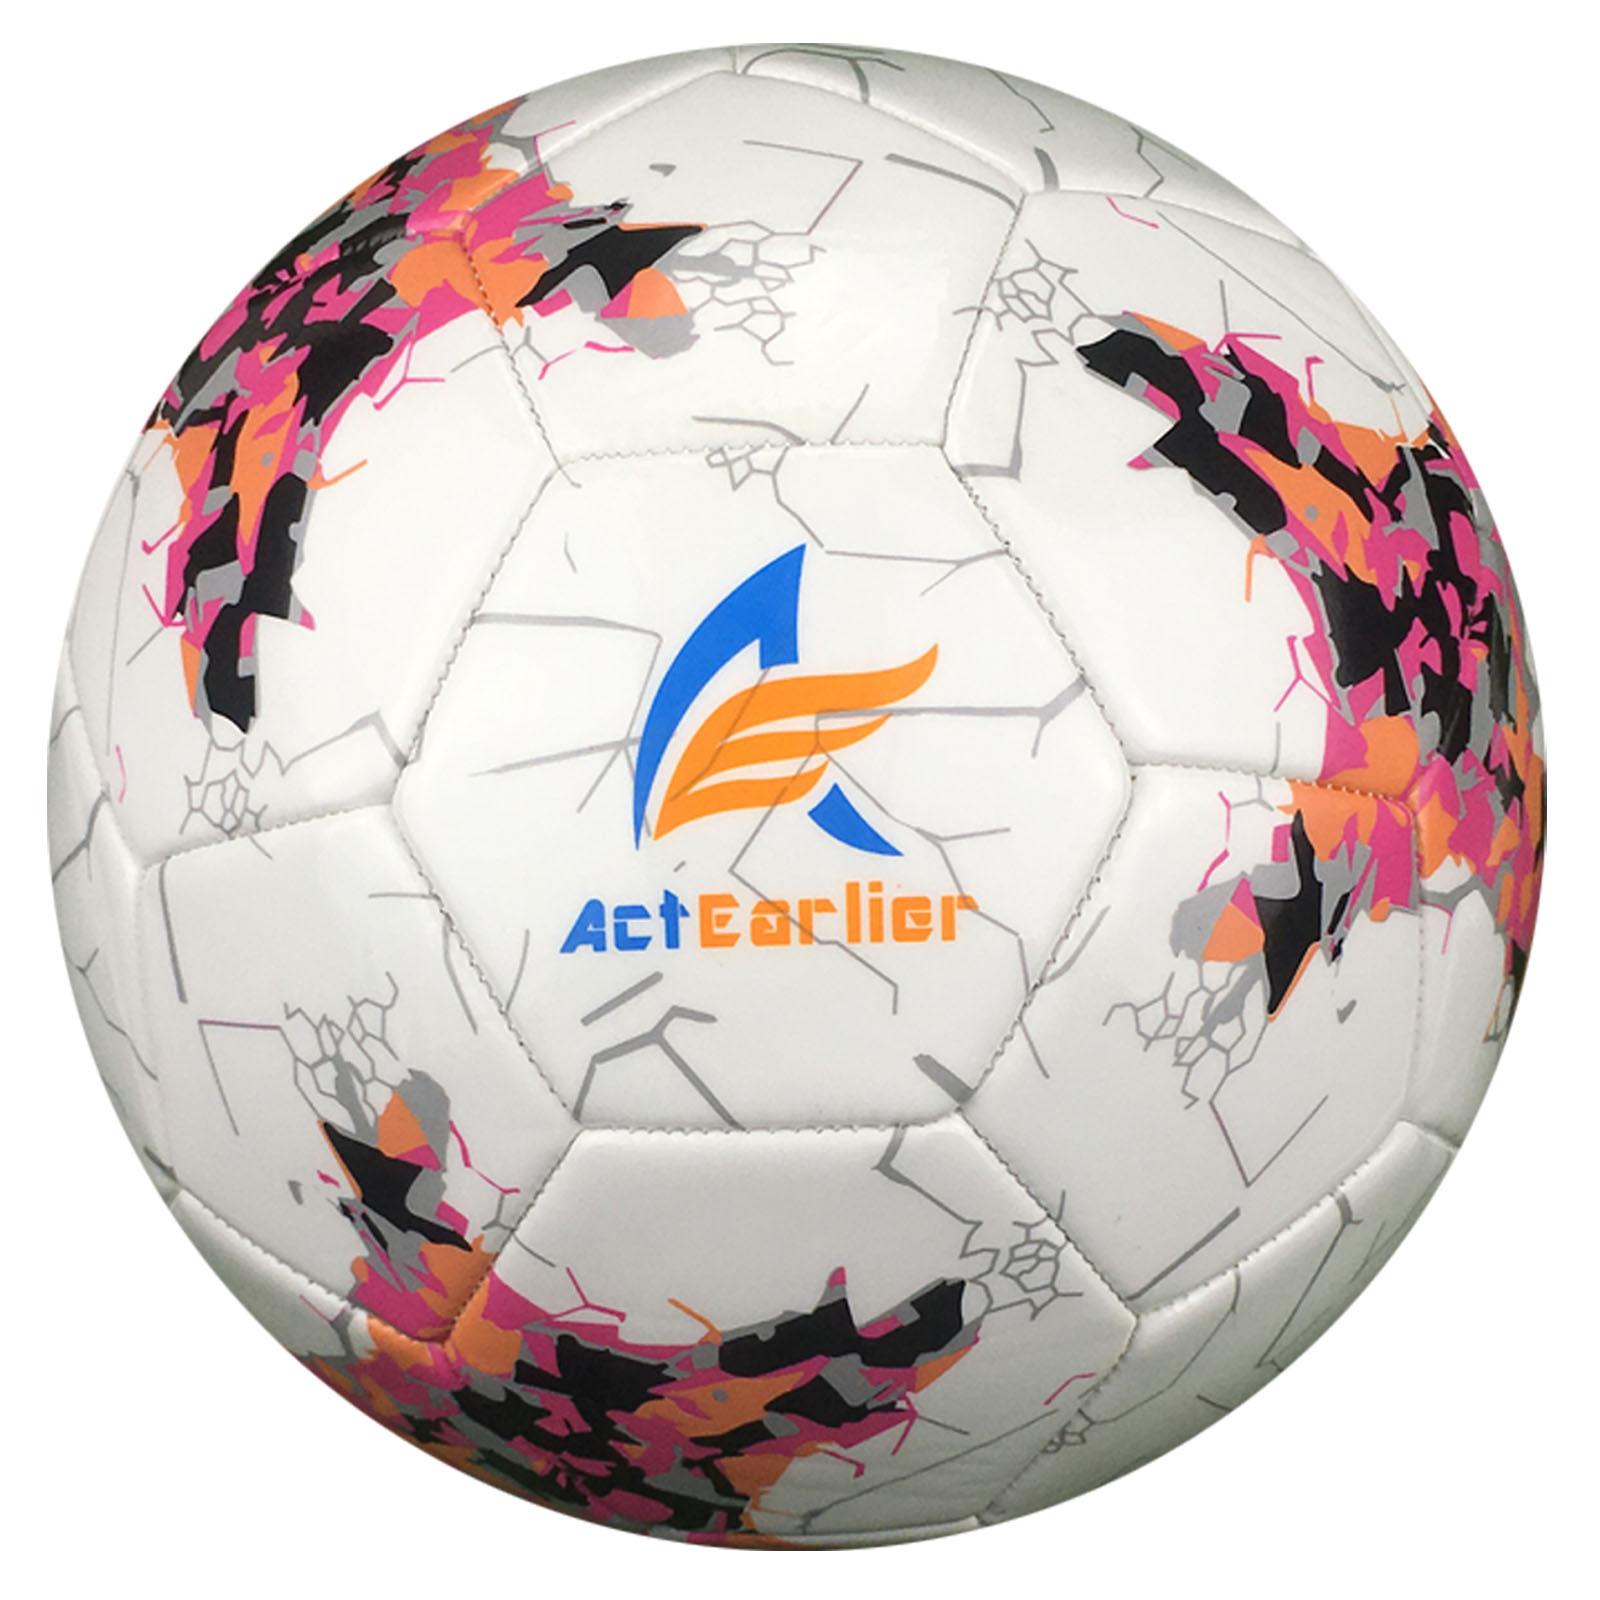 Top Football Ball World Cup 2018 - HTB1BHDinsjI8KJjSsppq6xbyVXaG  Pictures_362628 .jpg